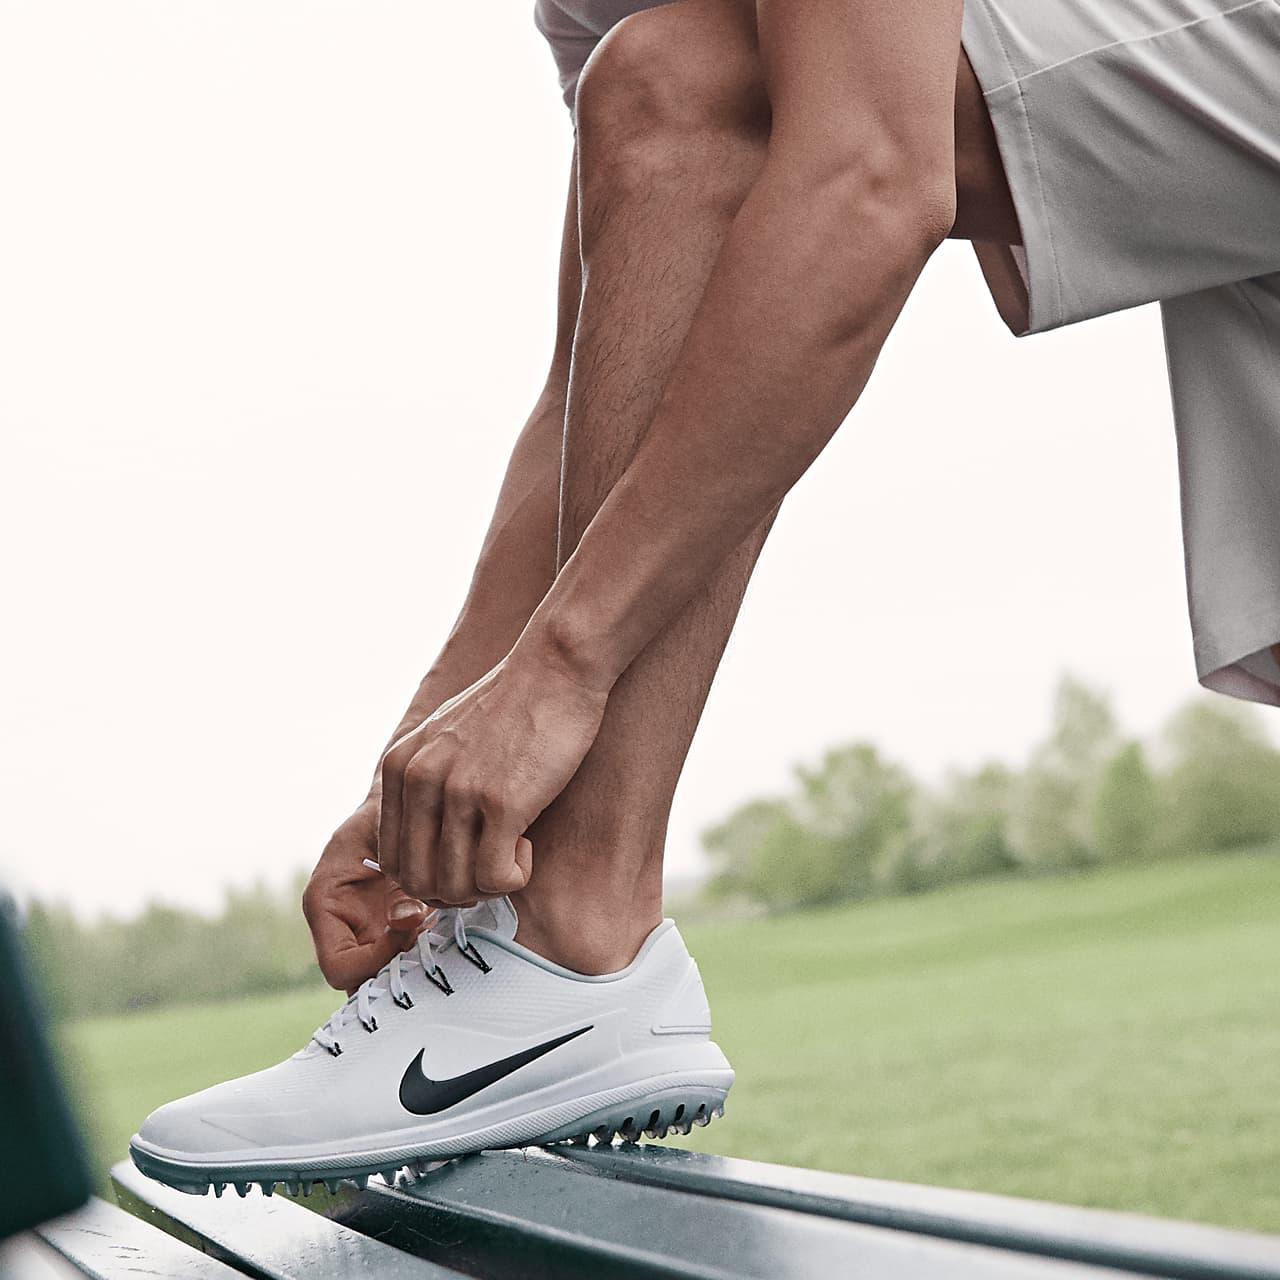 Nike Lunar Control Vapor 2 Men's Golf Shoe